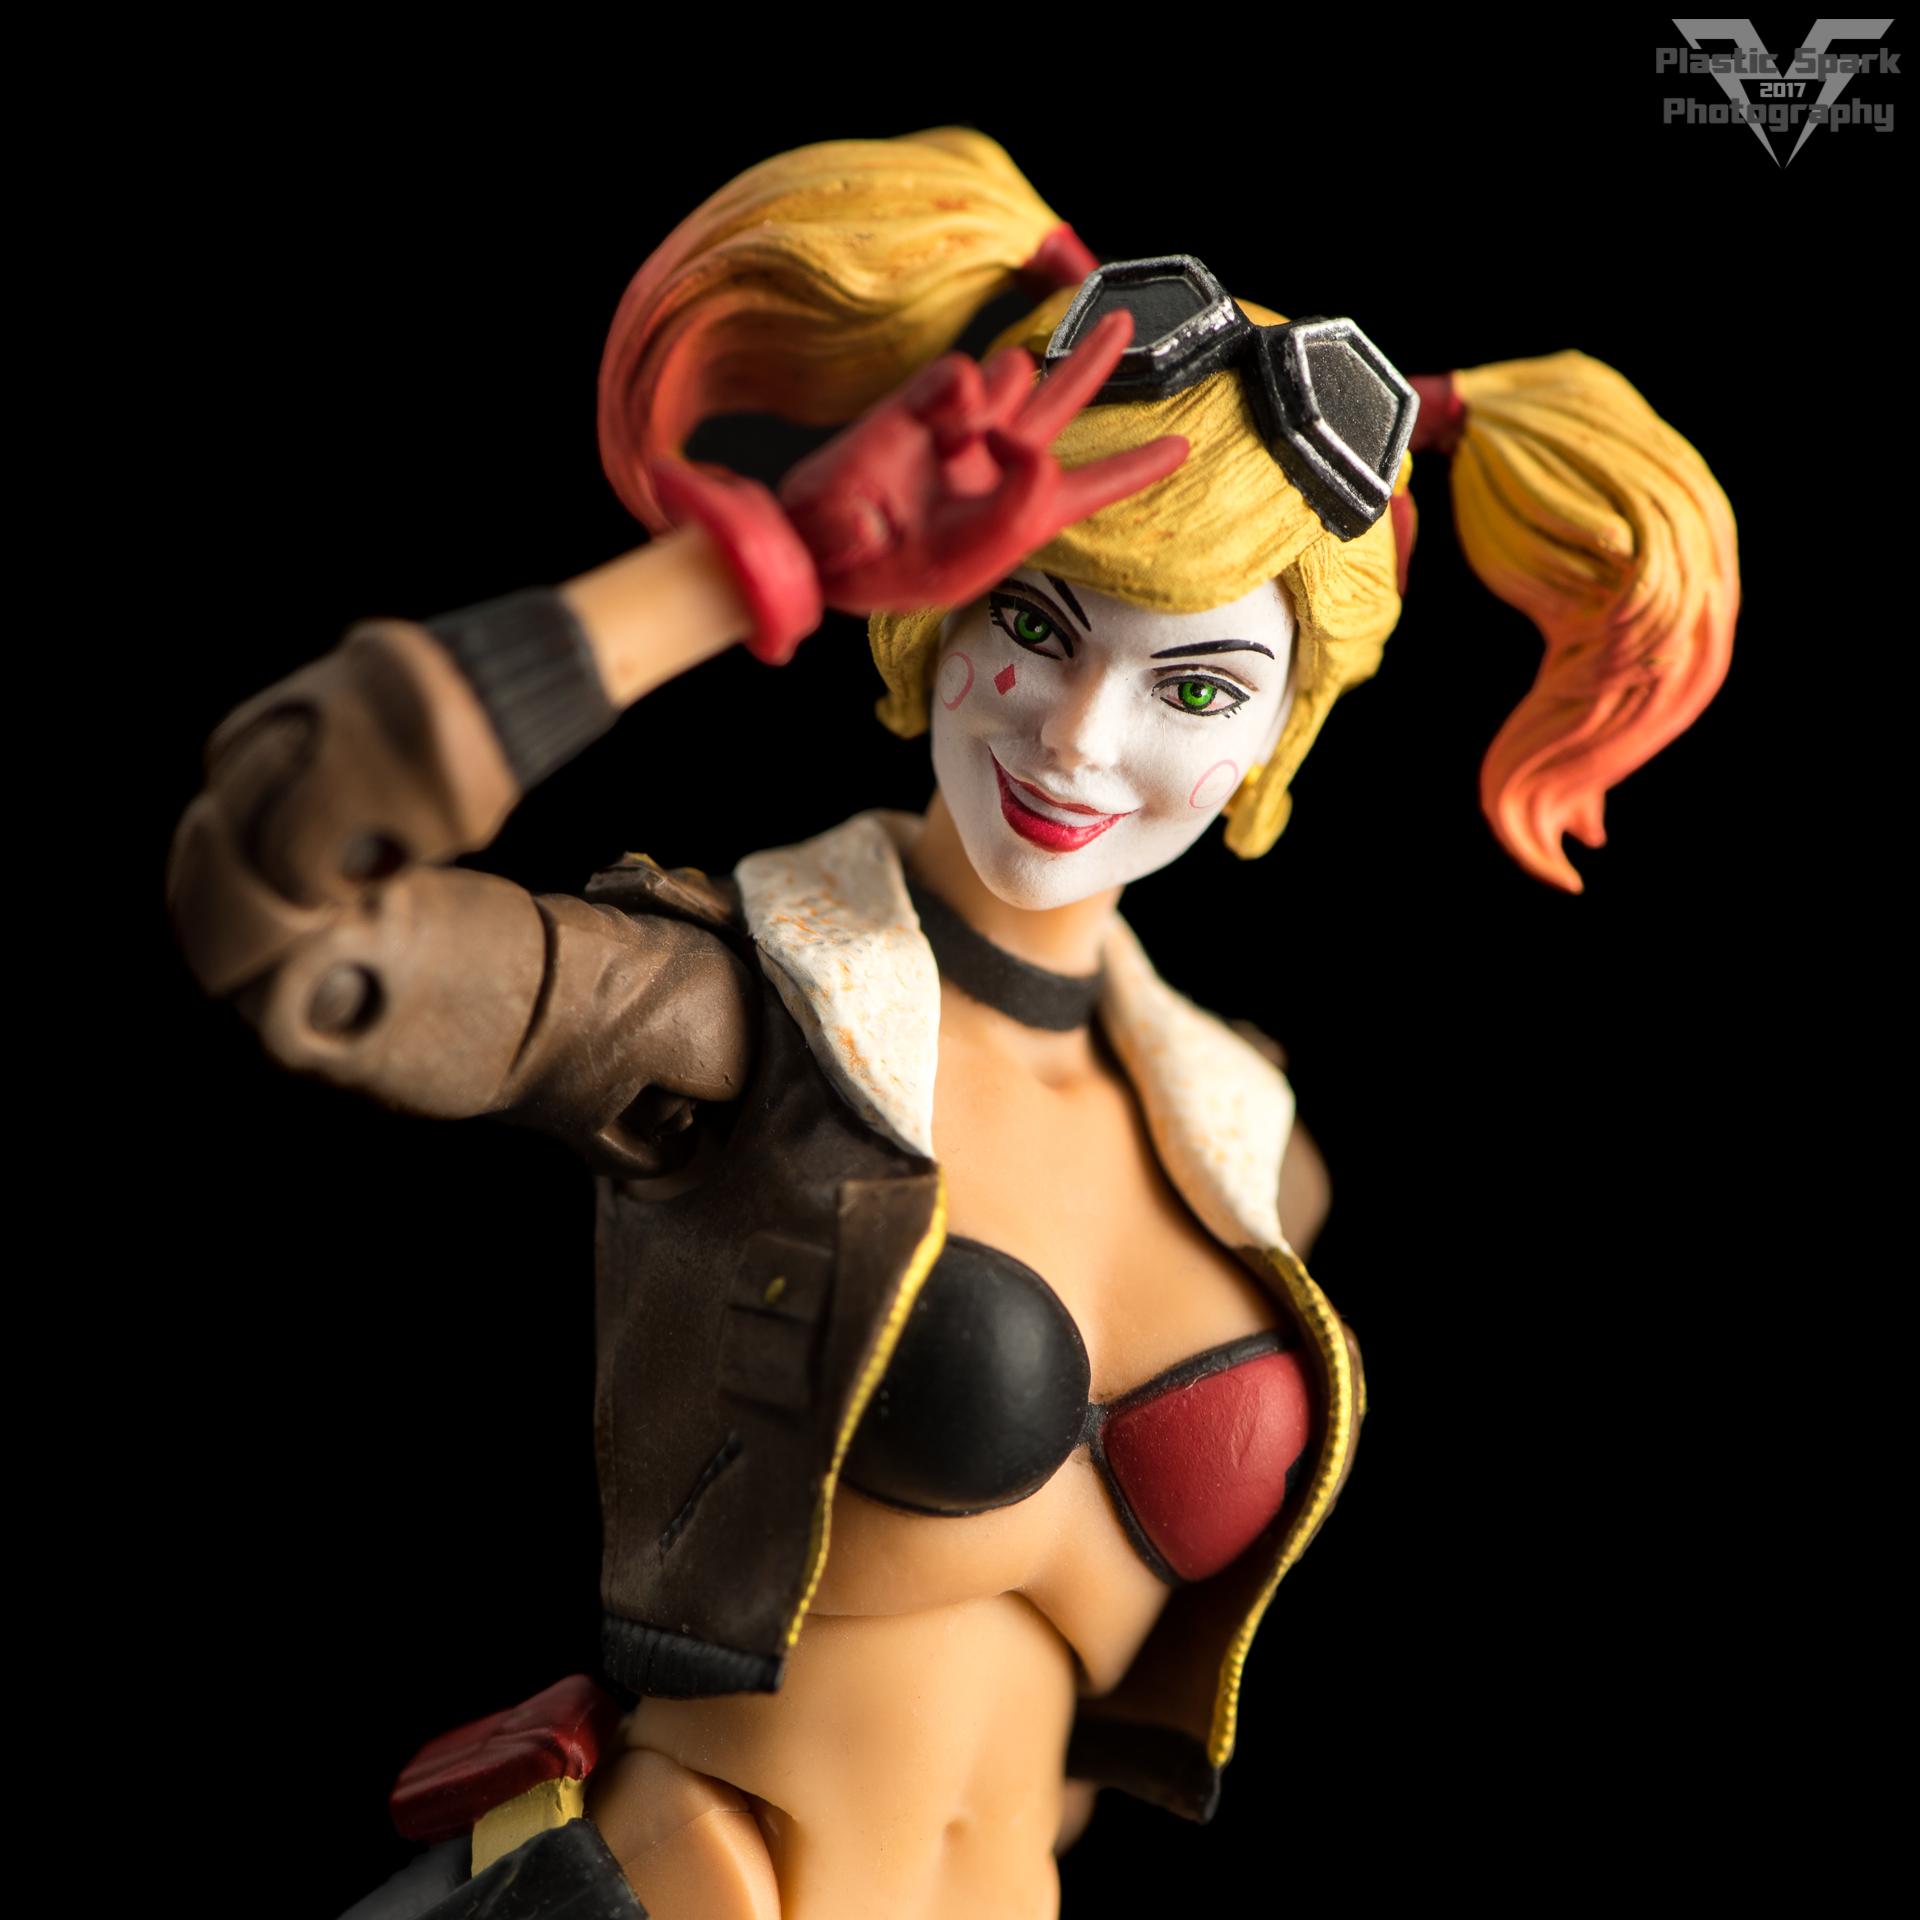 Bombshell-Harley-Quinn-(1-of-12).png